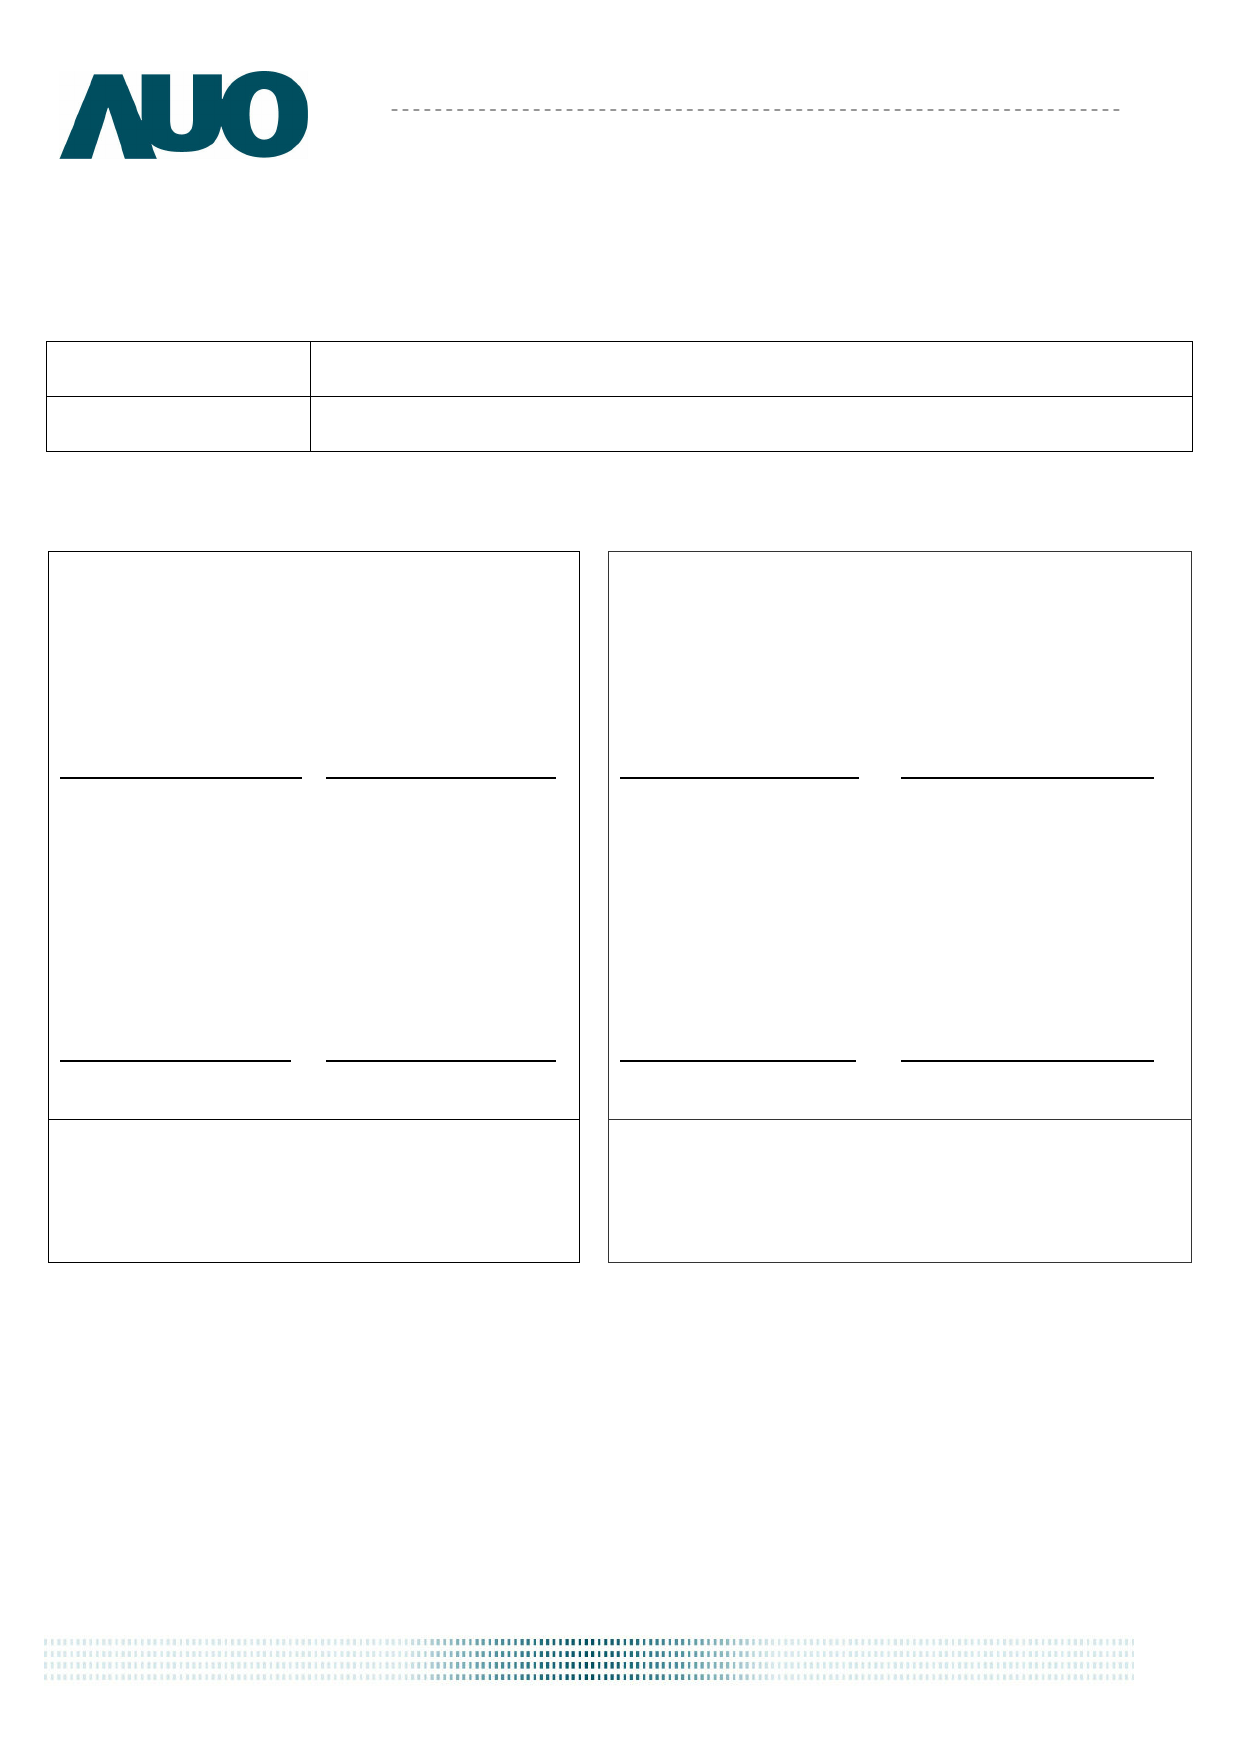 G057QN01-V1 datasheet